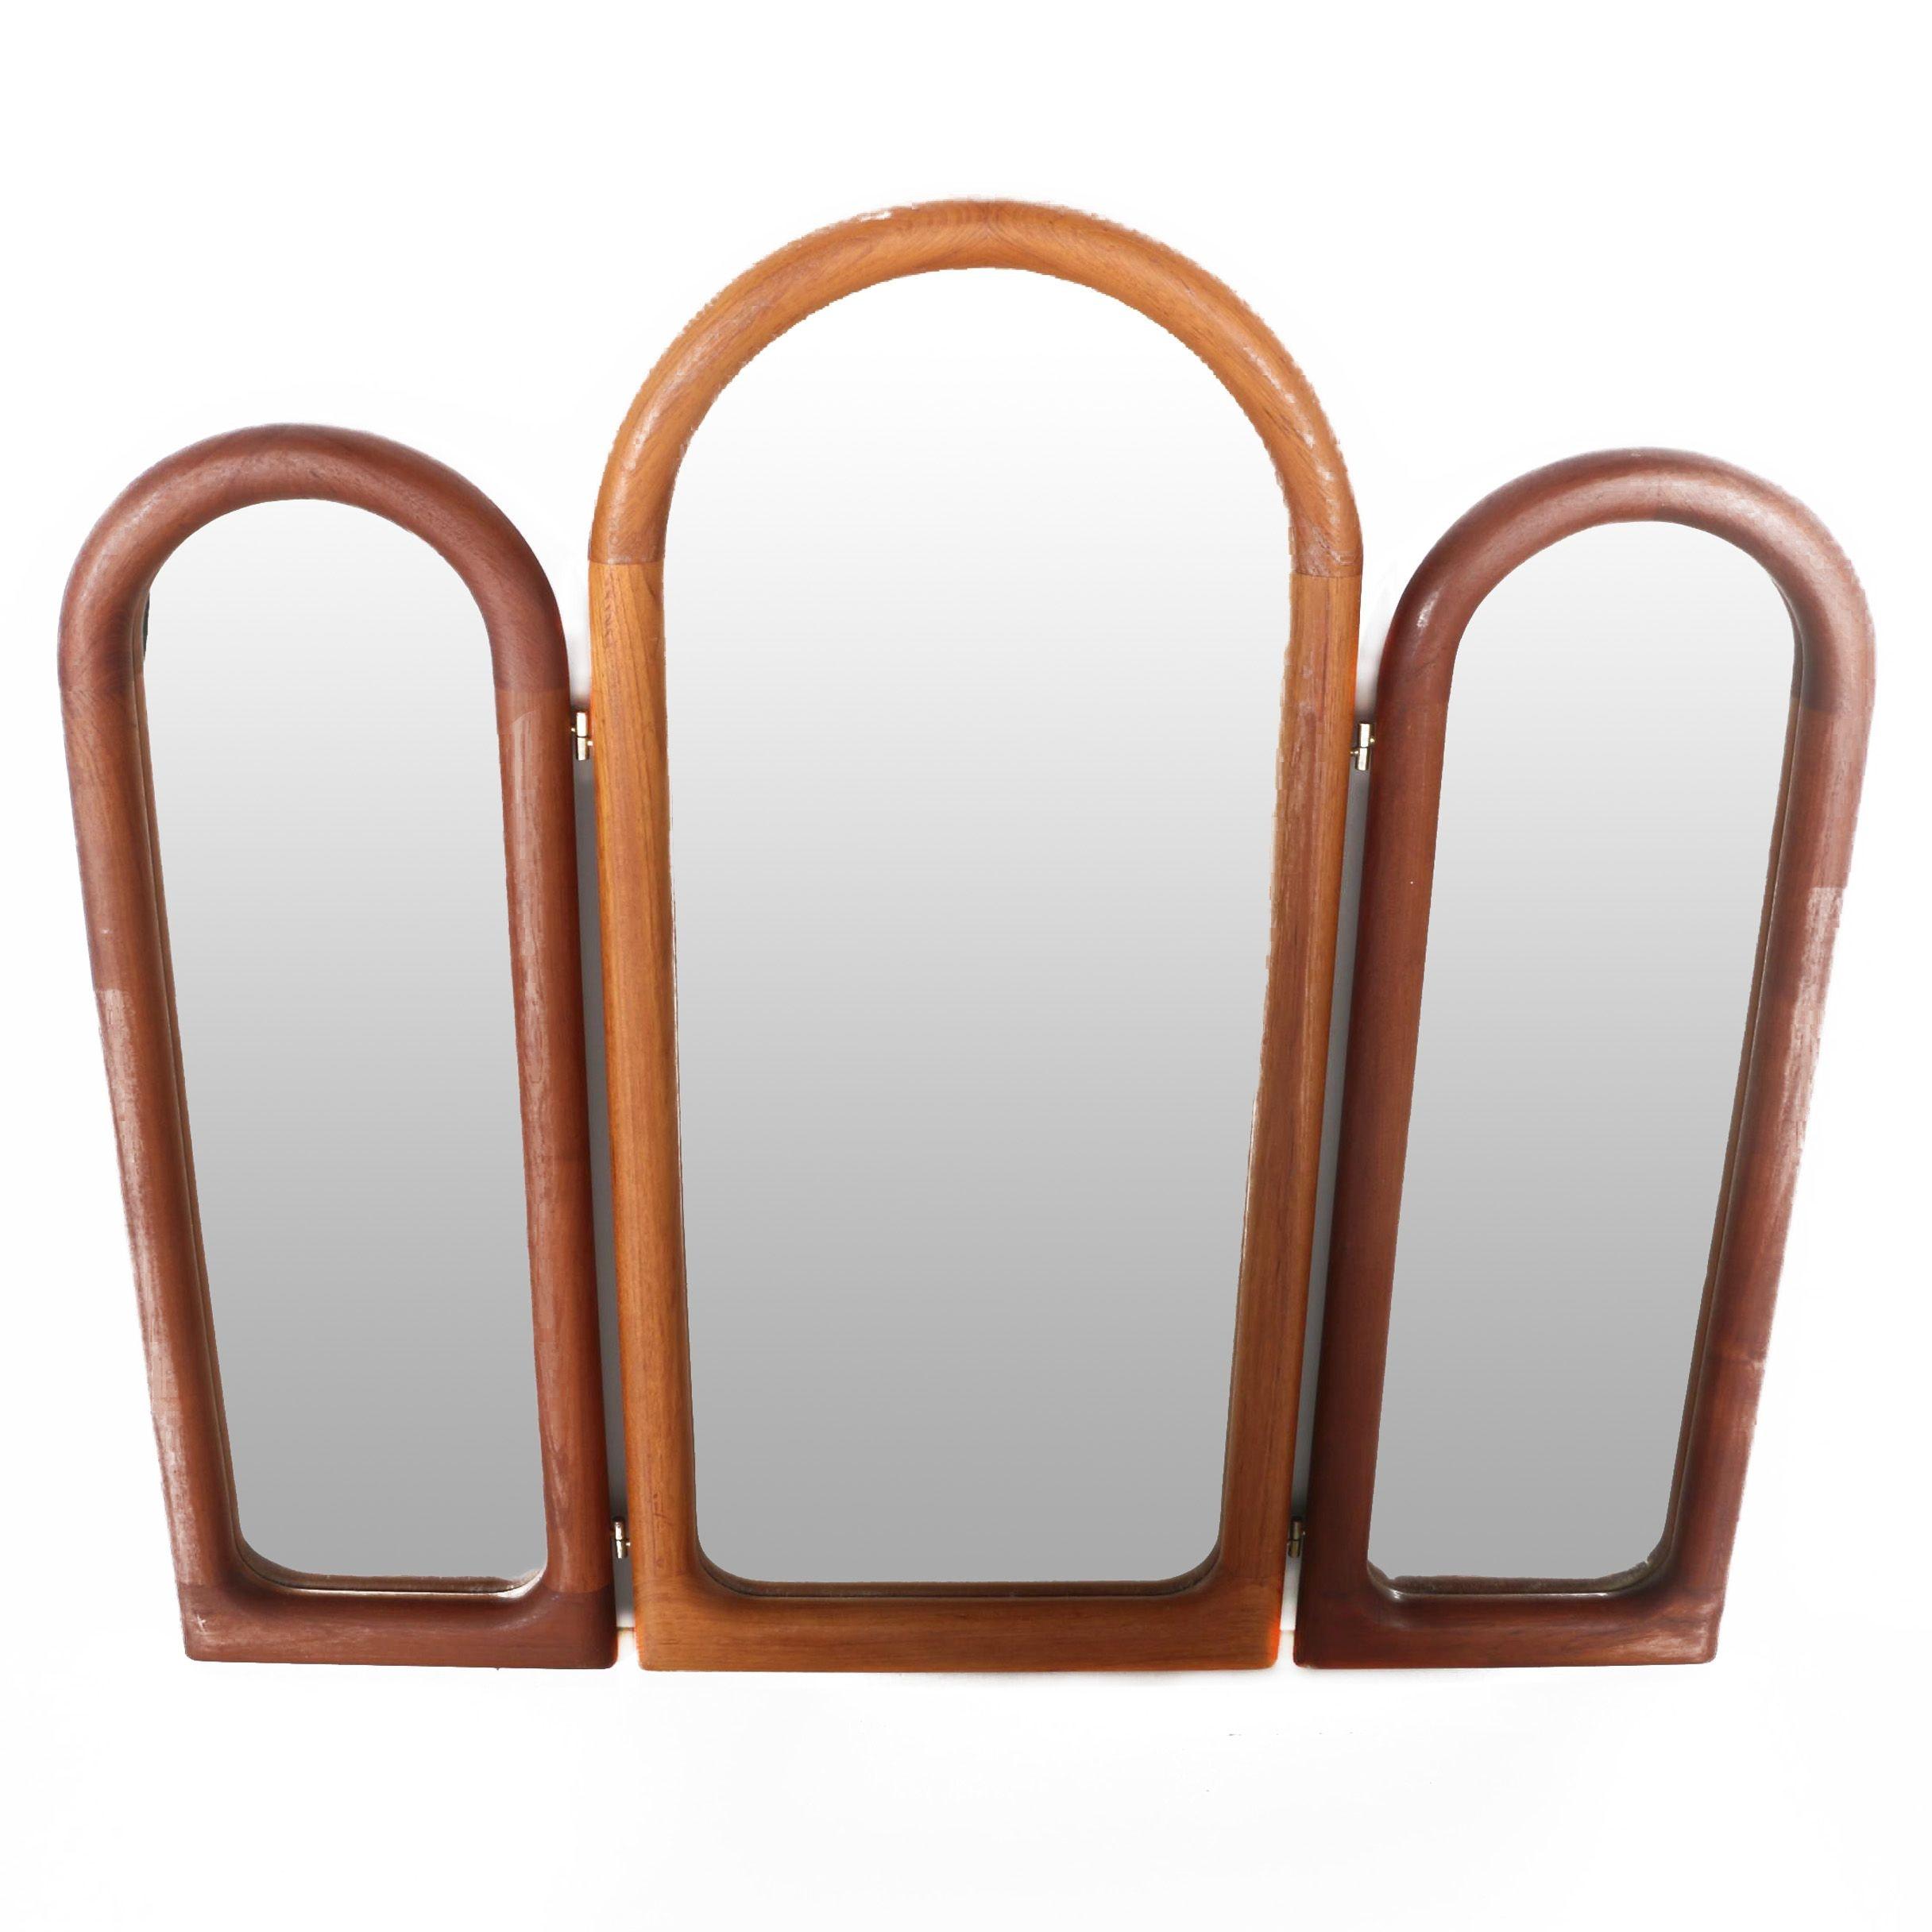 Danish Modern Hinged Vanity Mirrors by Schionning & Elgaard